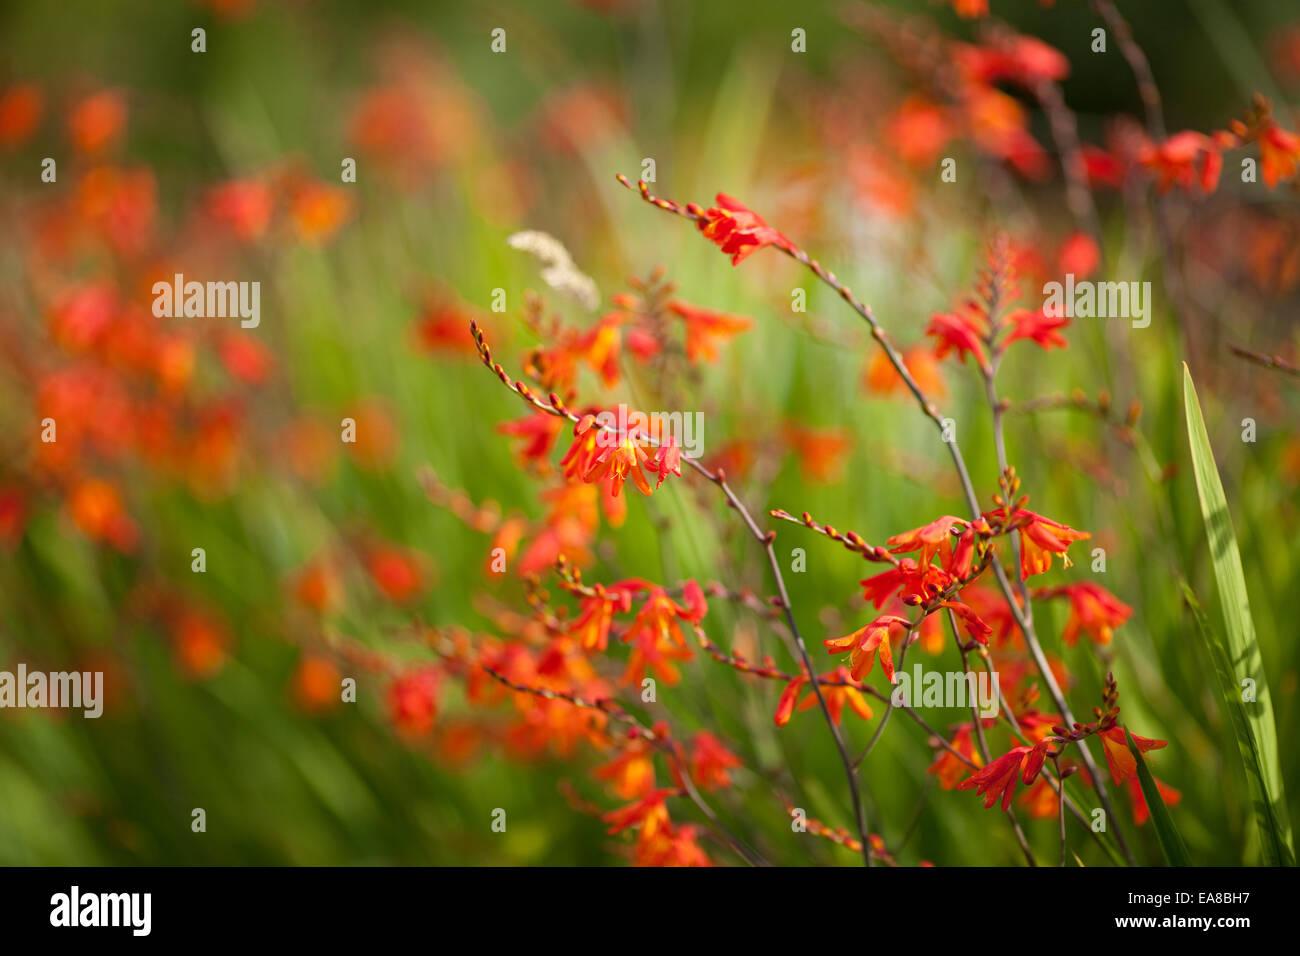 Crocosmia montbretia lucifer flowers with shallow depth of field crocosmia montbretia lucifer flowers with shallow depth of field orange flowers in the garden member of the iris family izmirmasajfo